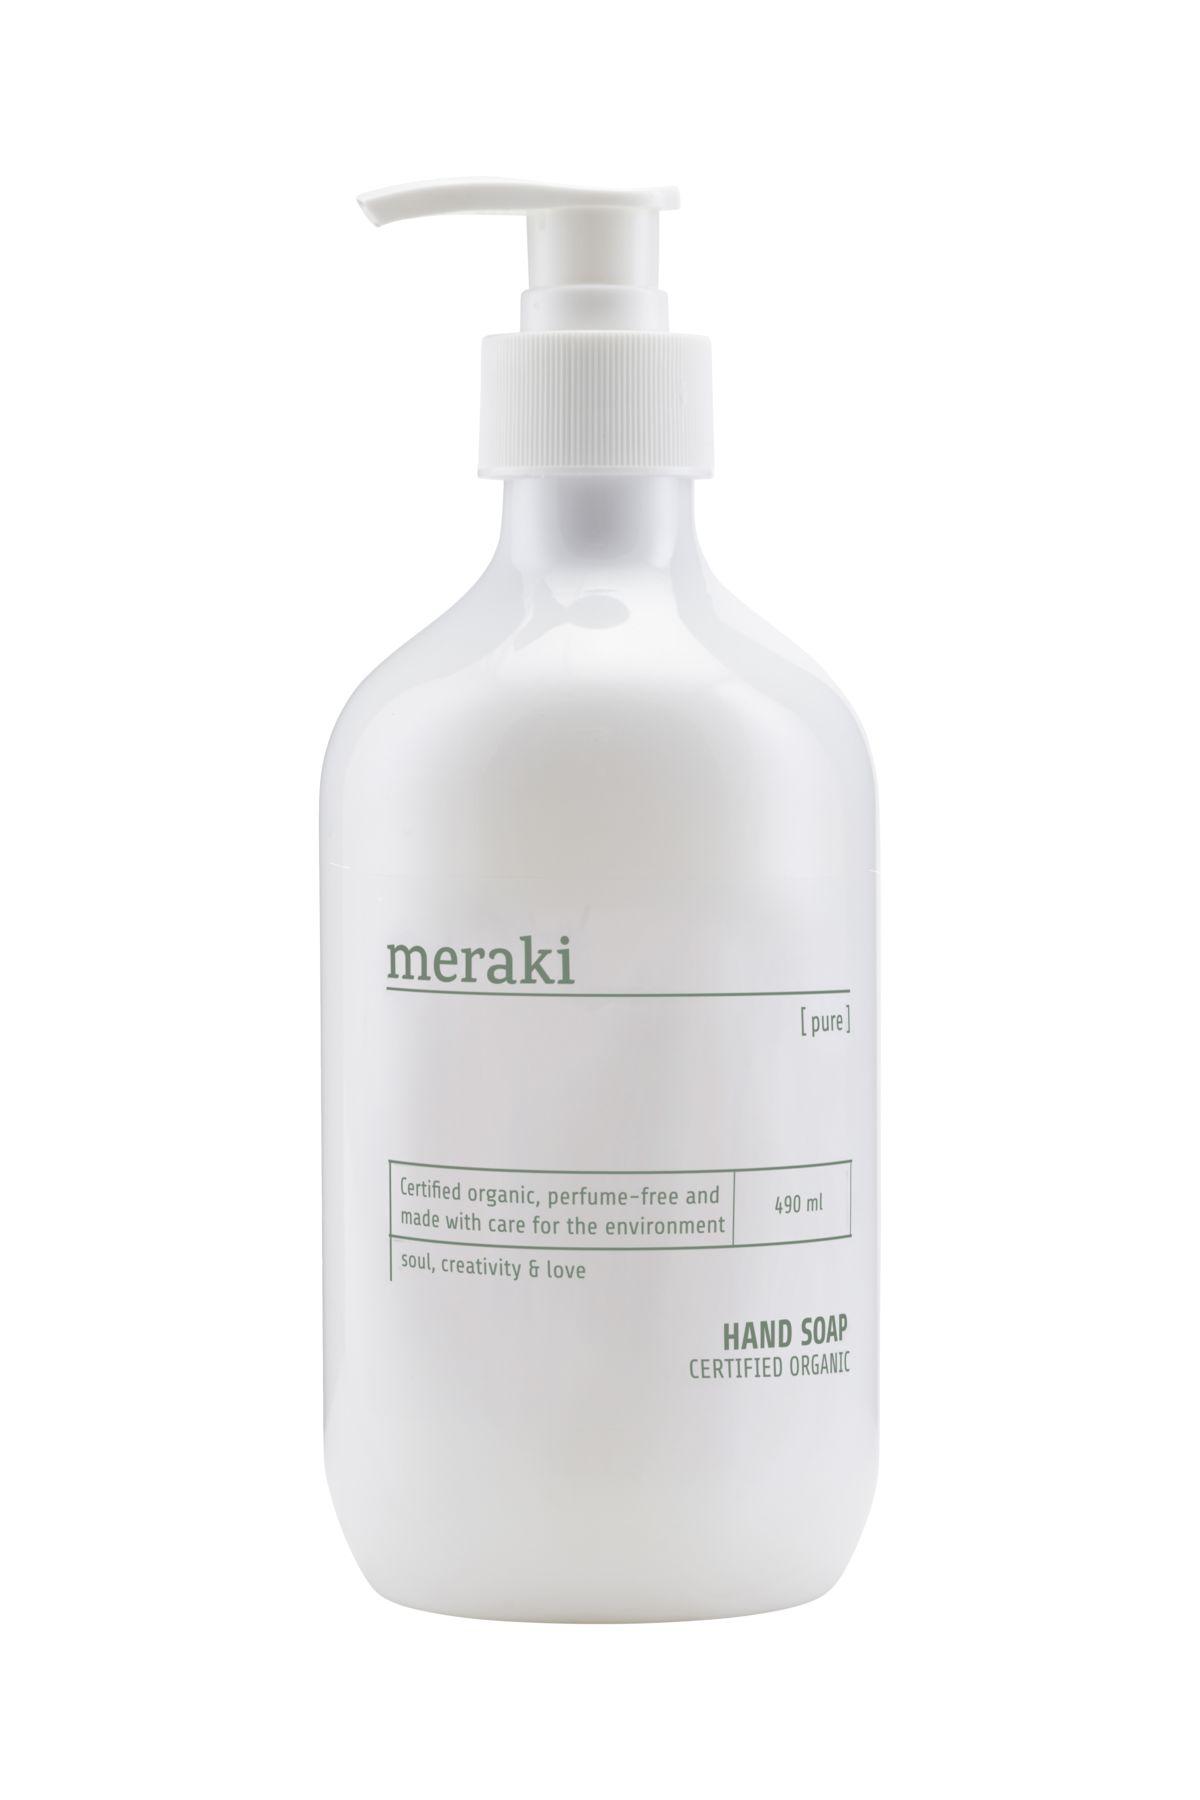 Meraki Pure Hand Soap, 490 ml